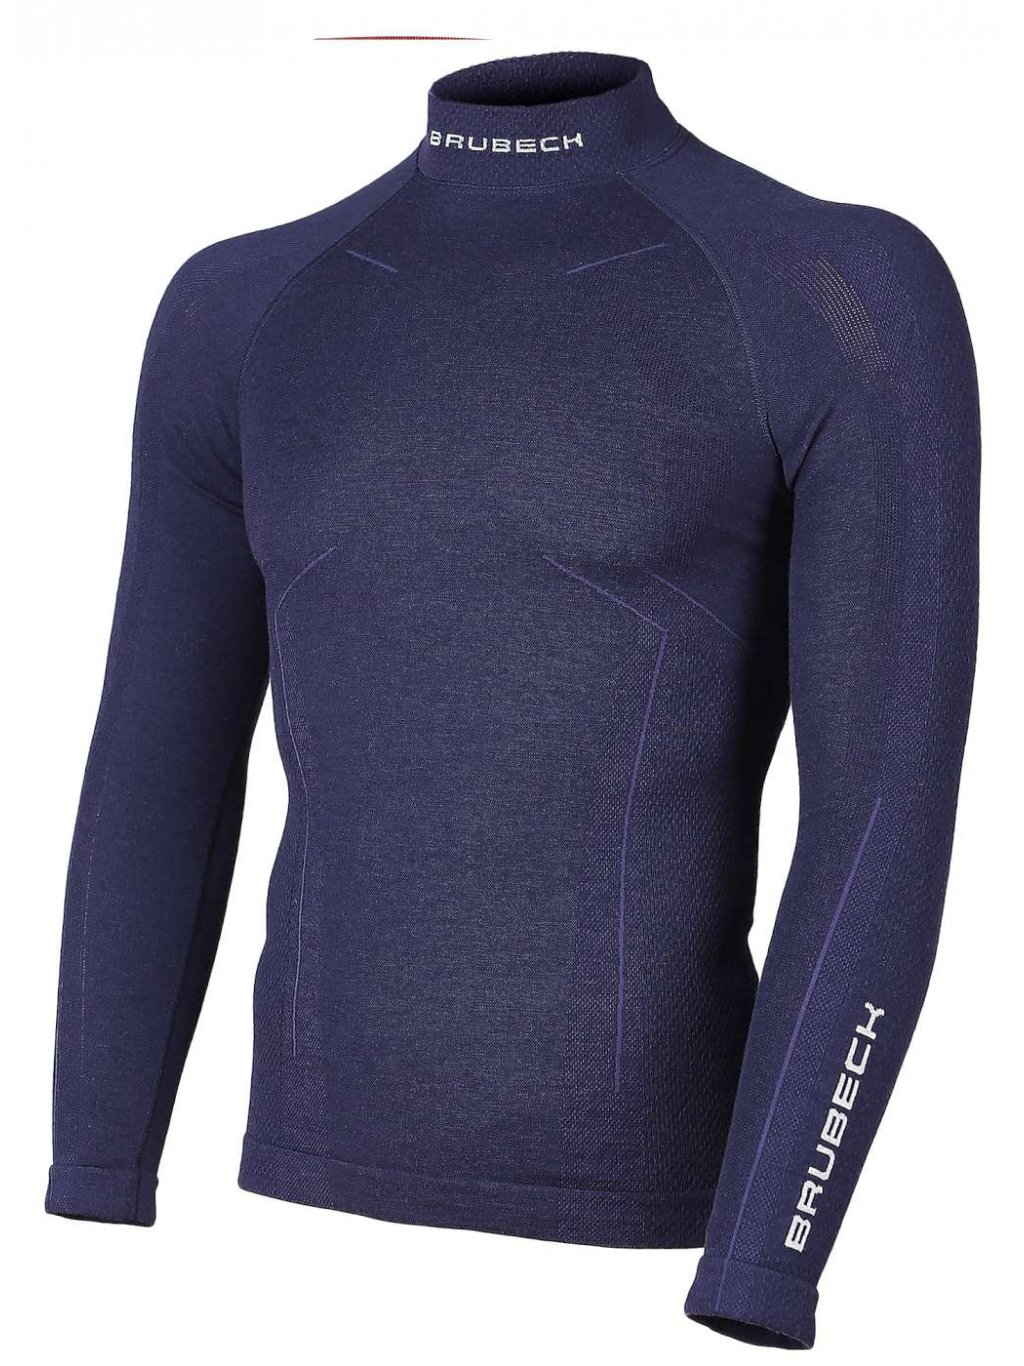 Brubeck pánské tričko s dl. rukávem WOOL MERINO